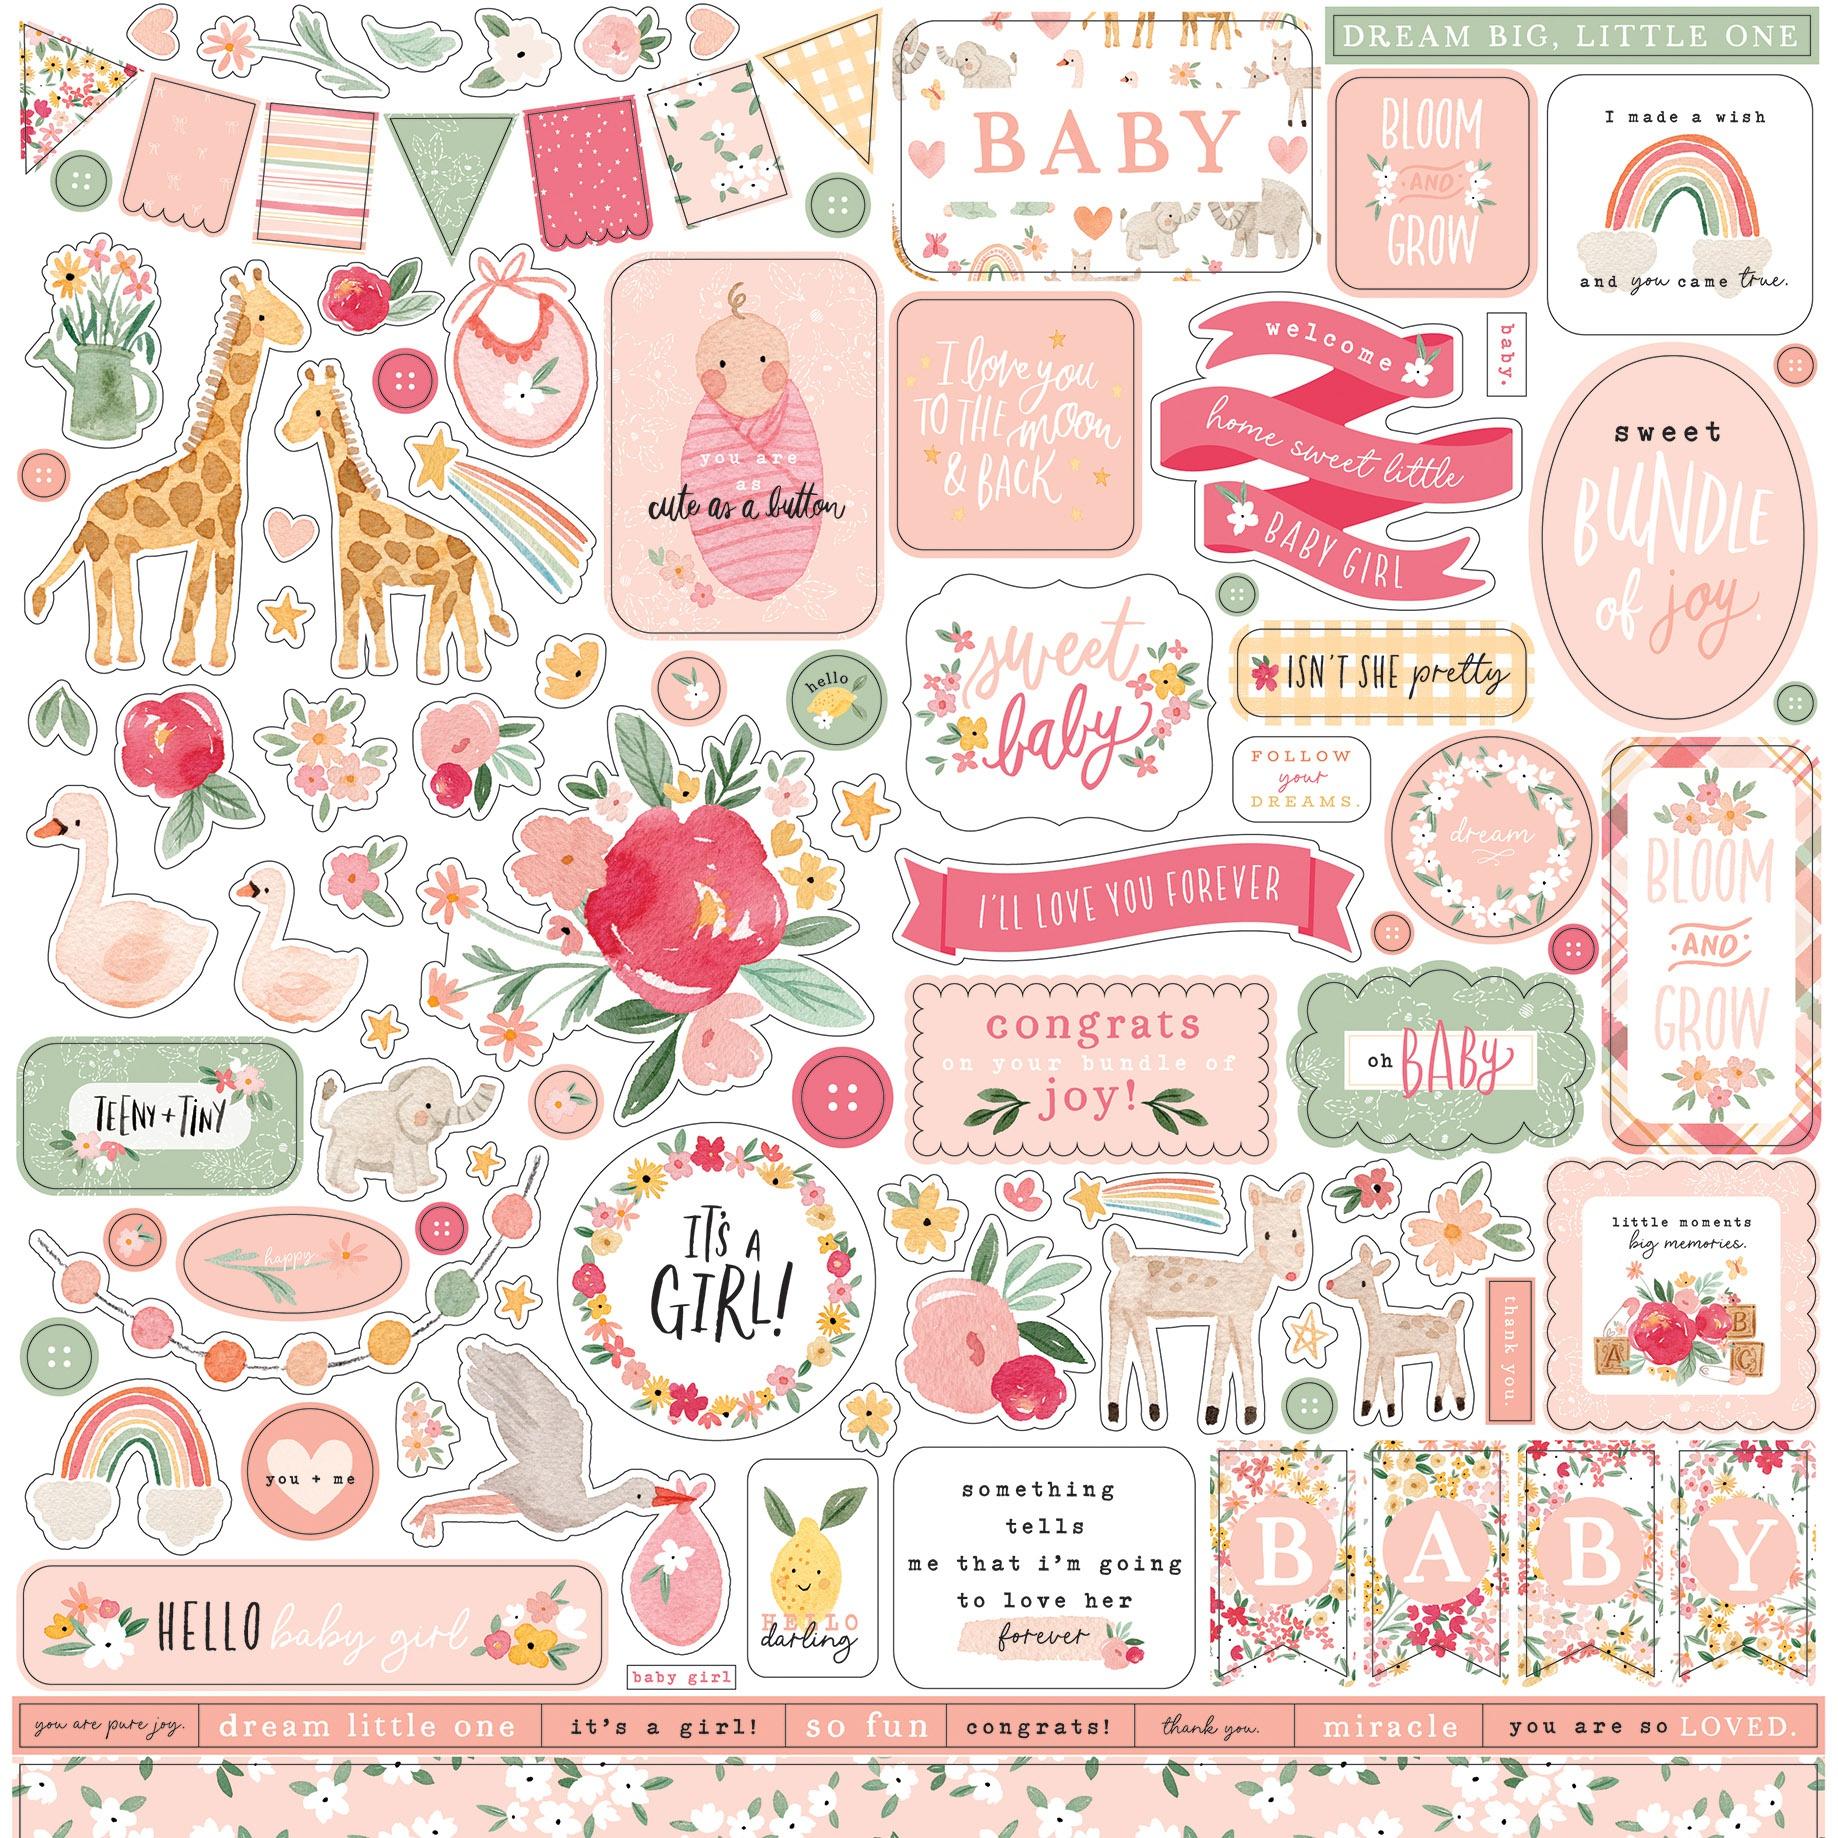 Echo Park - Welcome Baby Girl - 12x12 Element Sticker Sheet